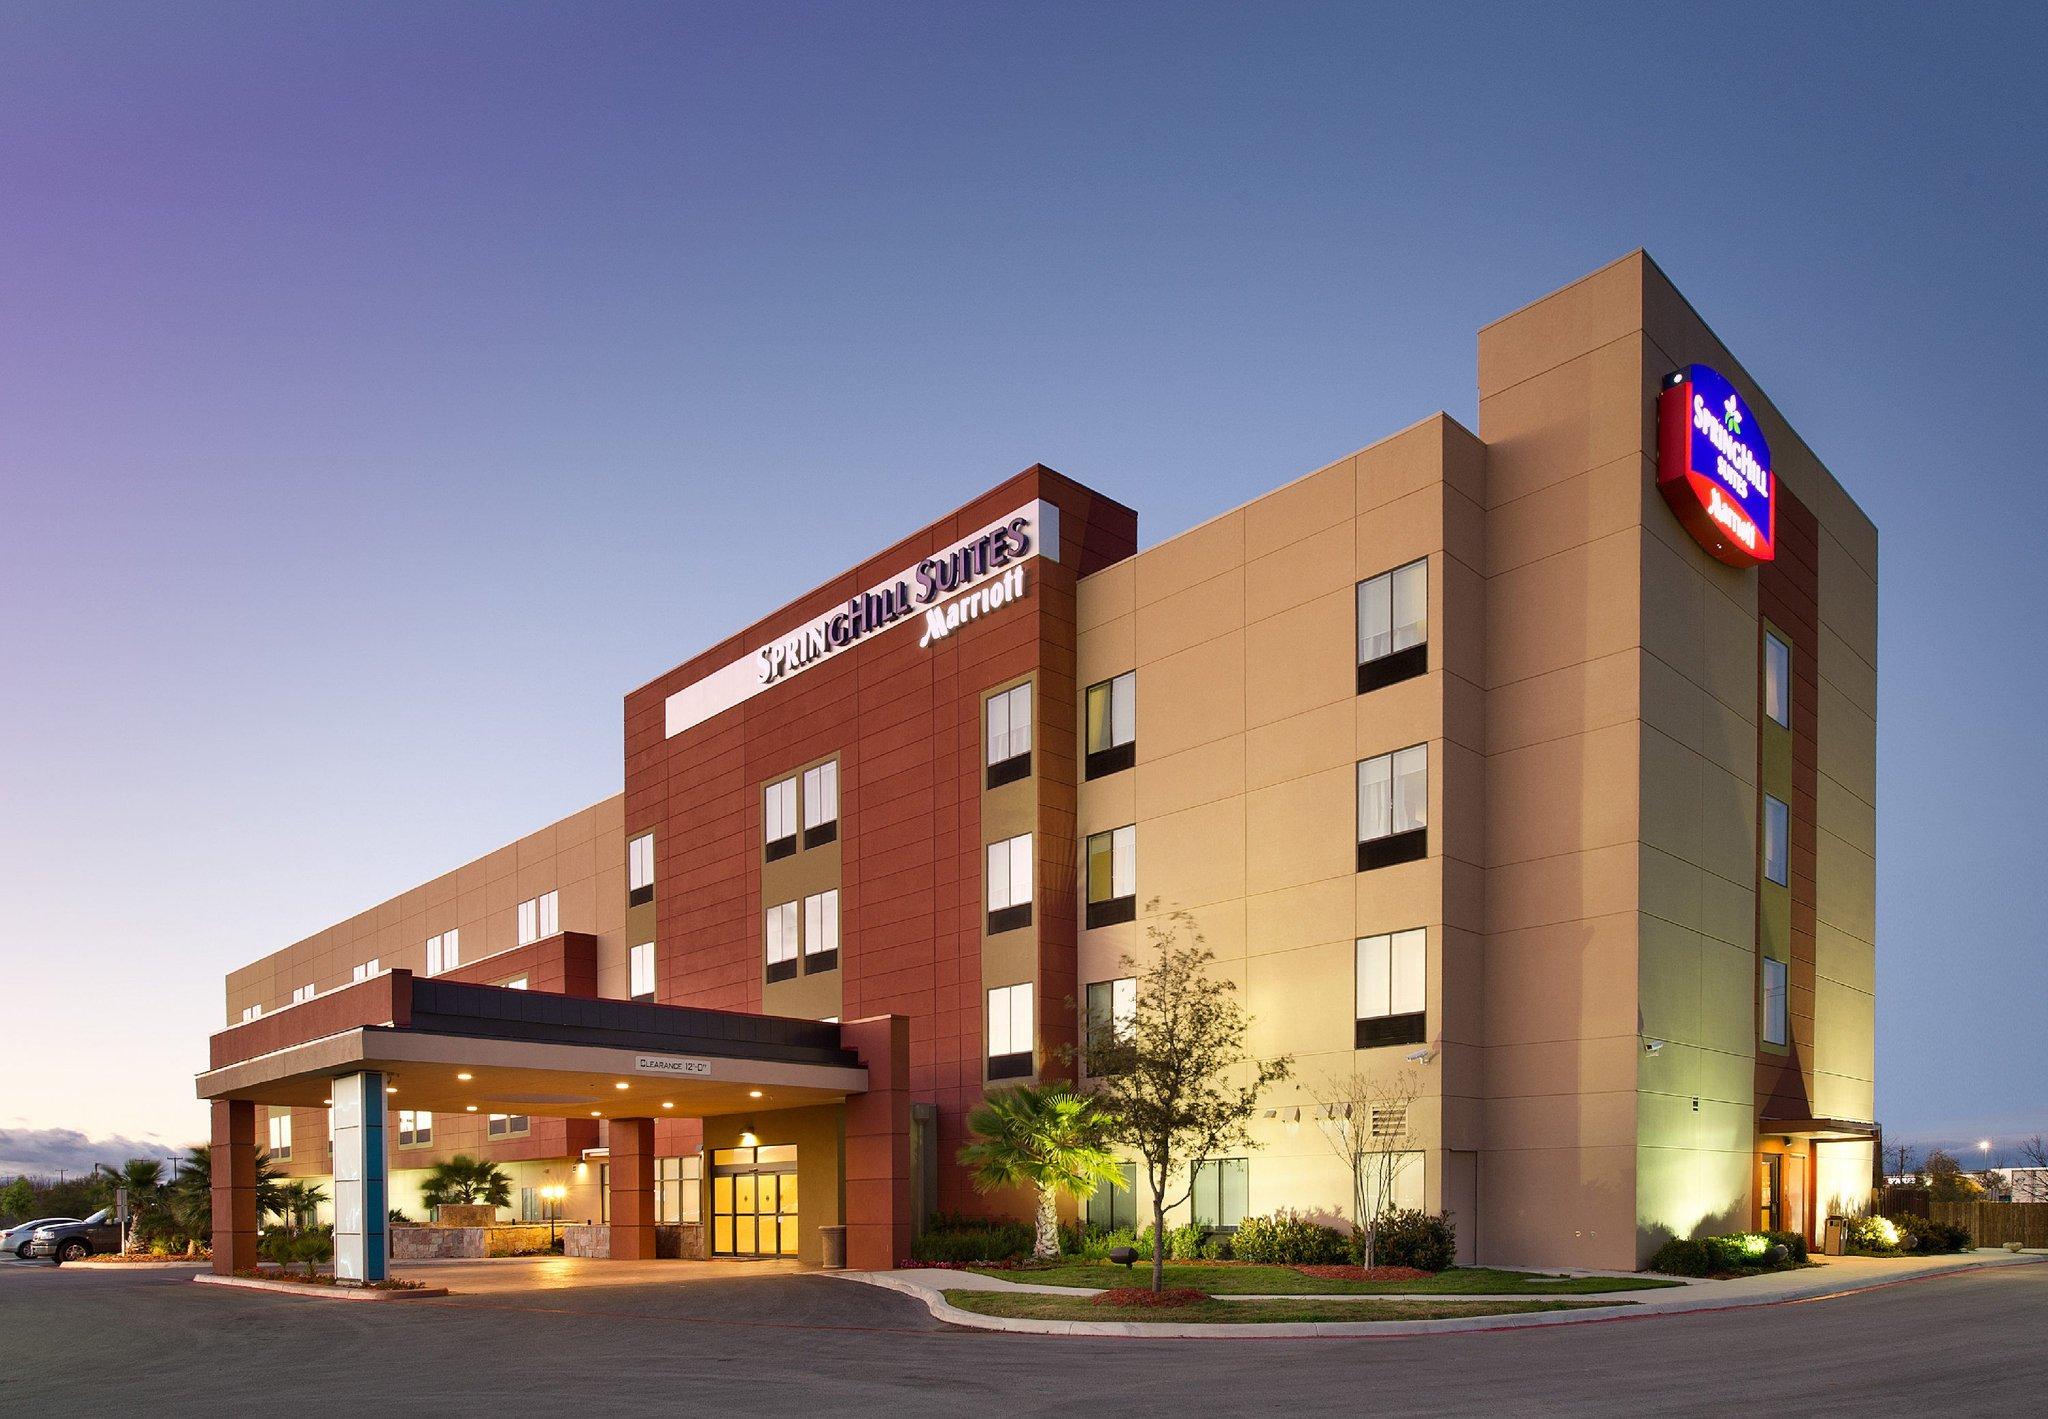 SpringHill Suites San Antonio SeaWorldR/Lackland